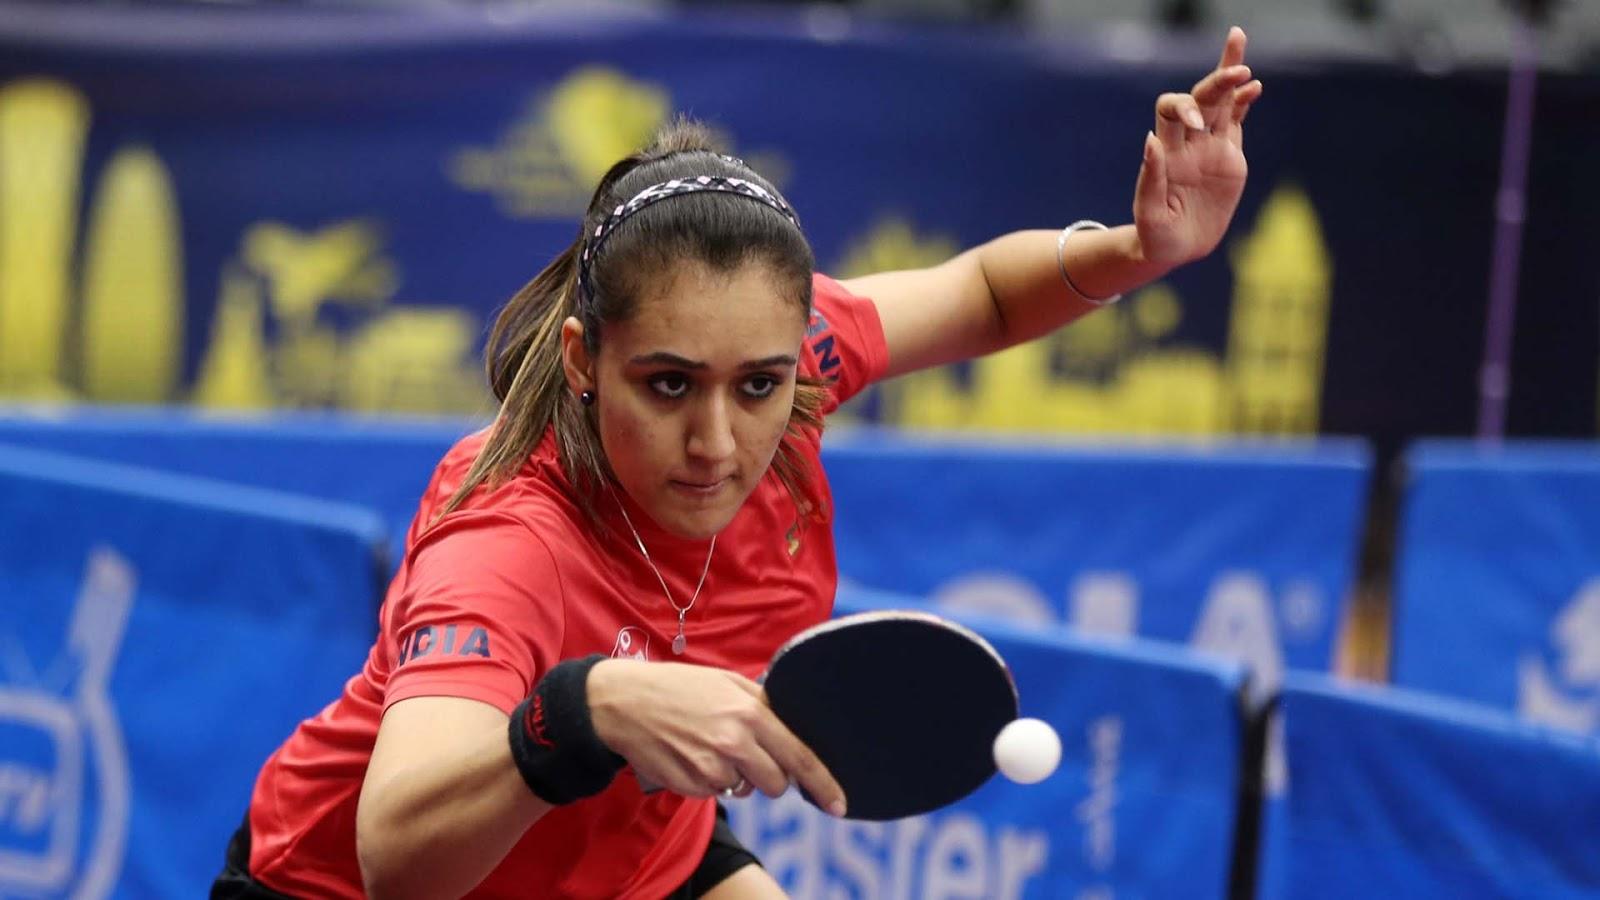 Manika Batra Awarded Breakthrough Table Tennis Star By Ittf